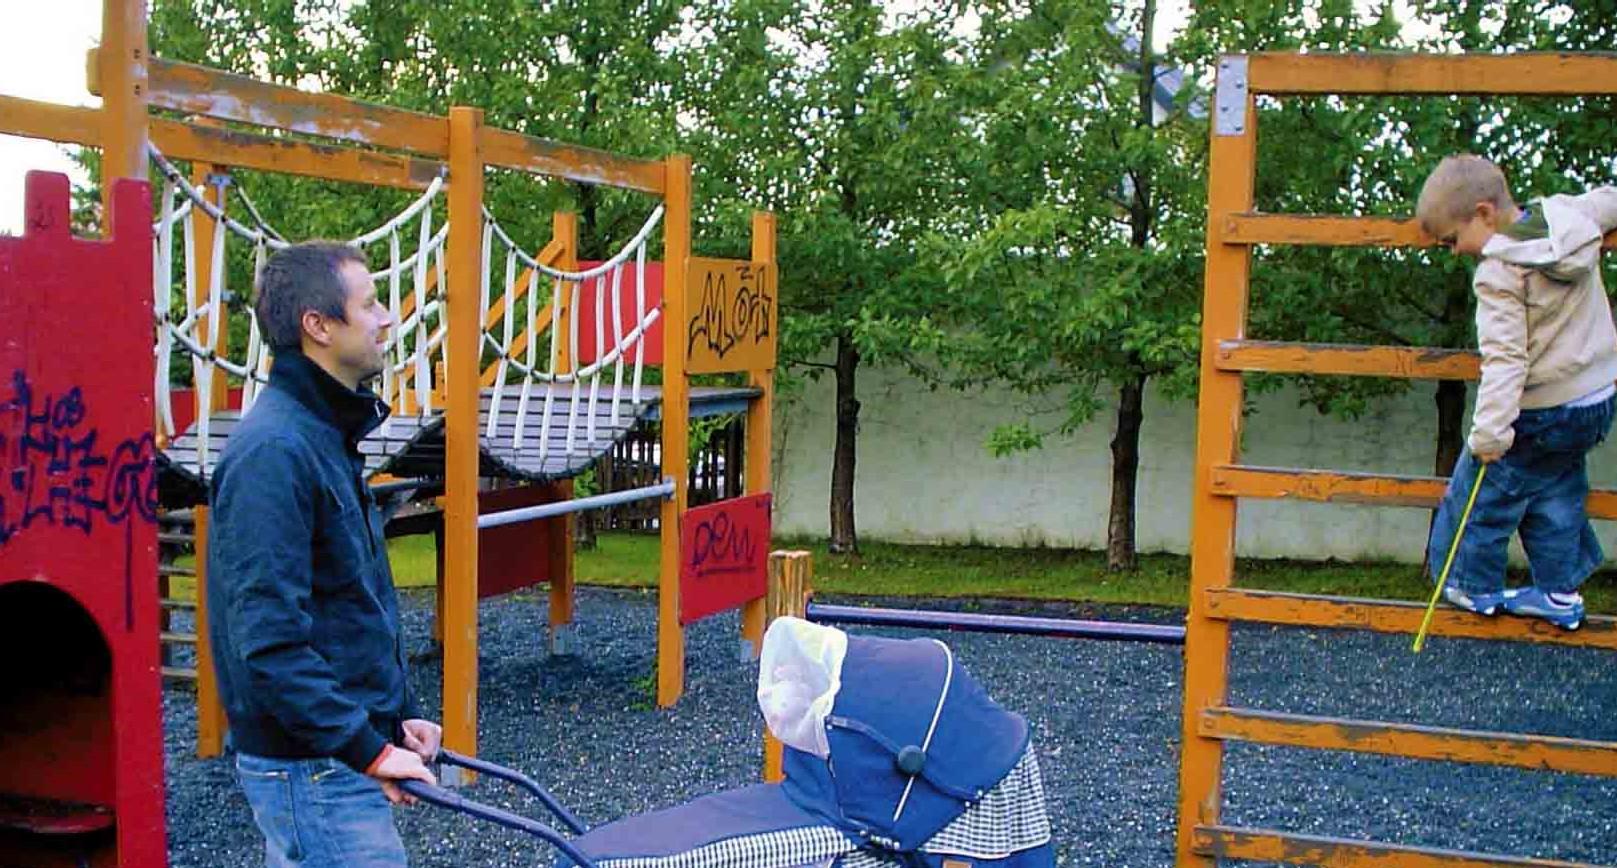 Iceland: The parental revolution